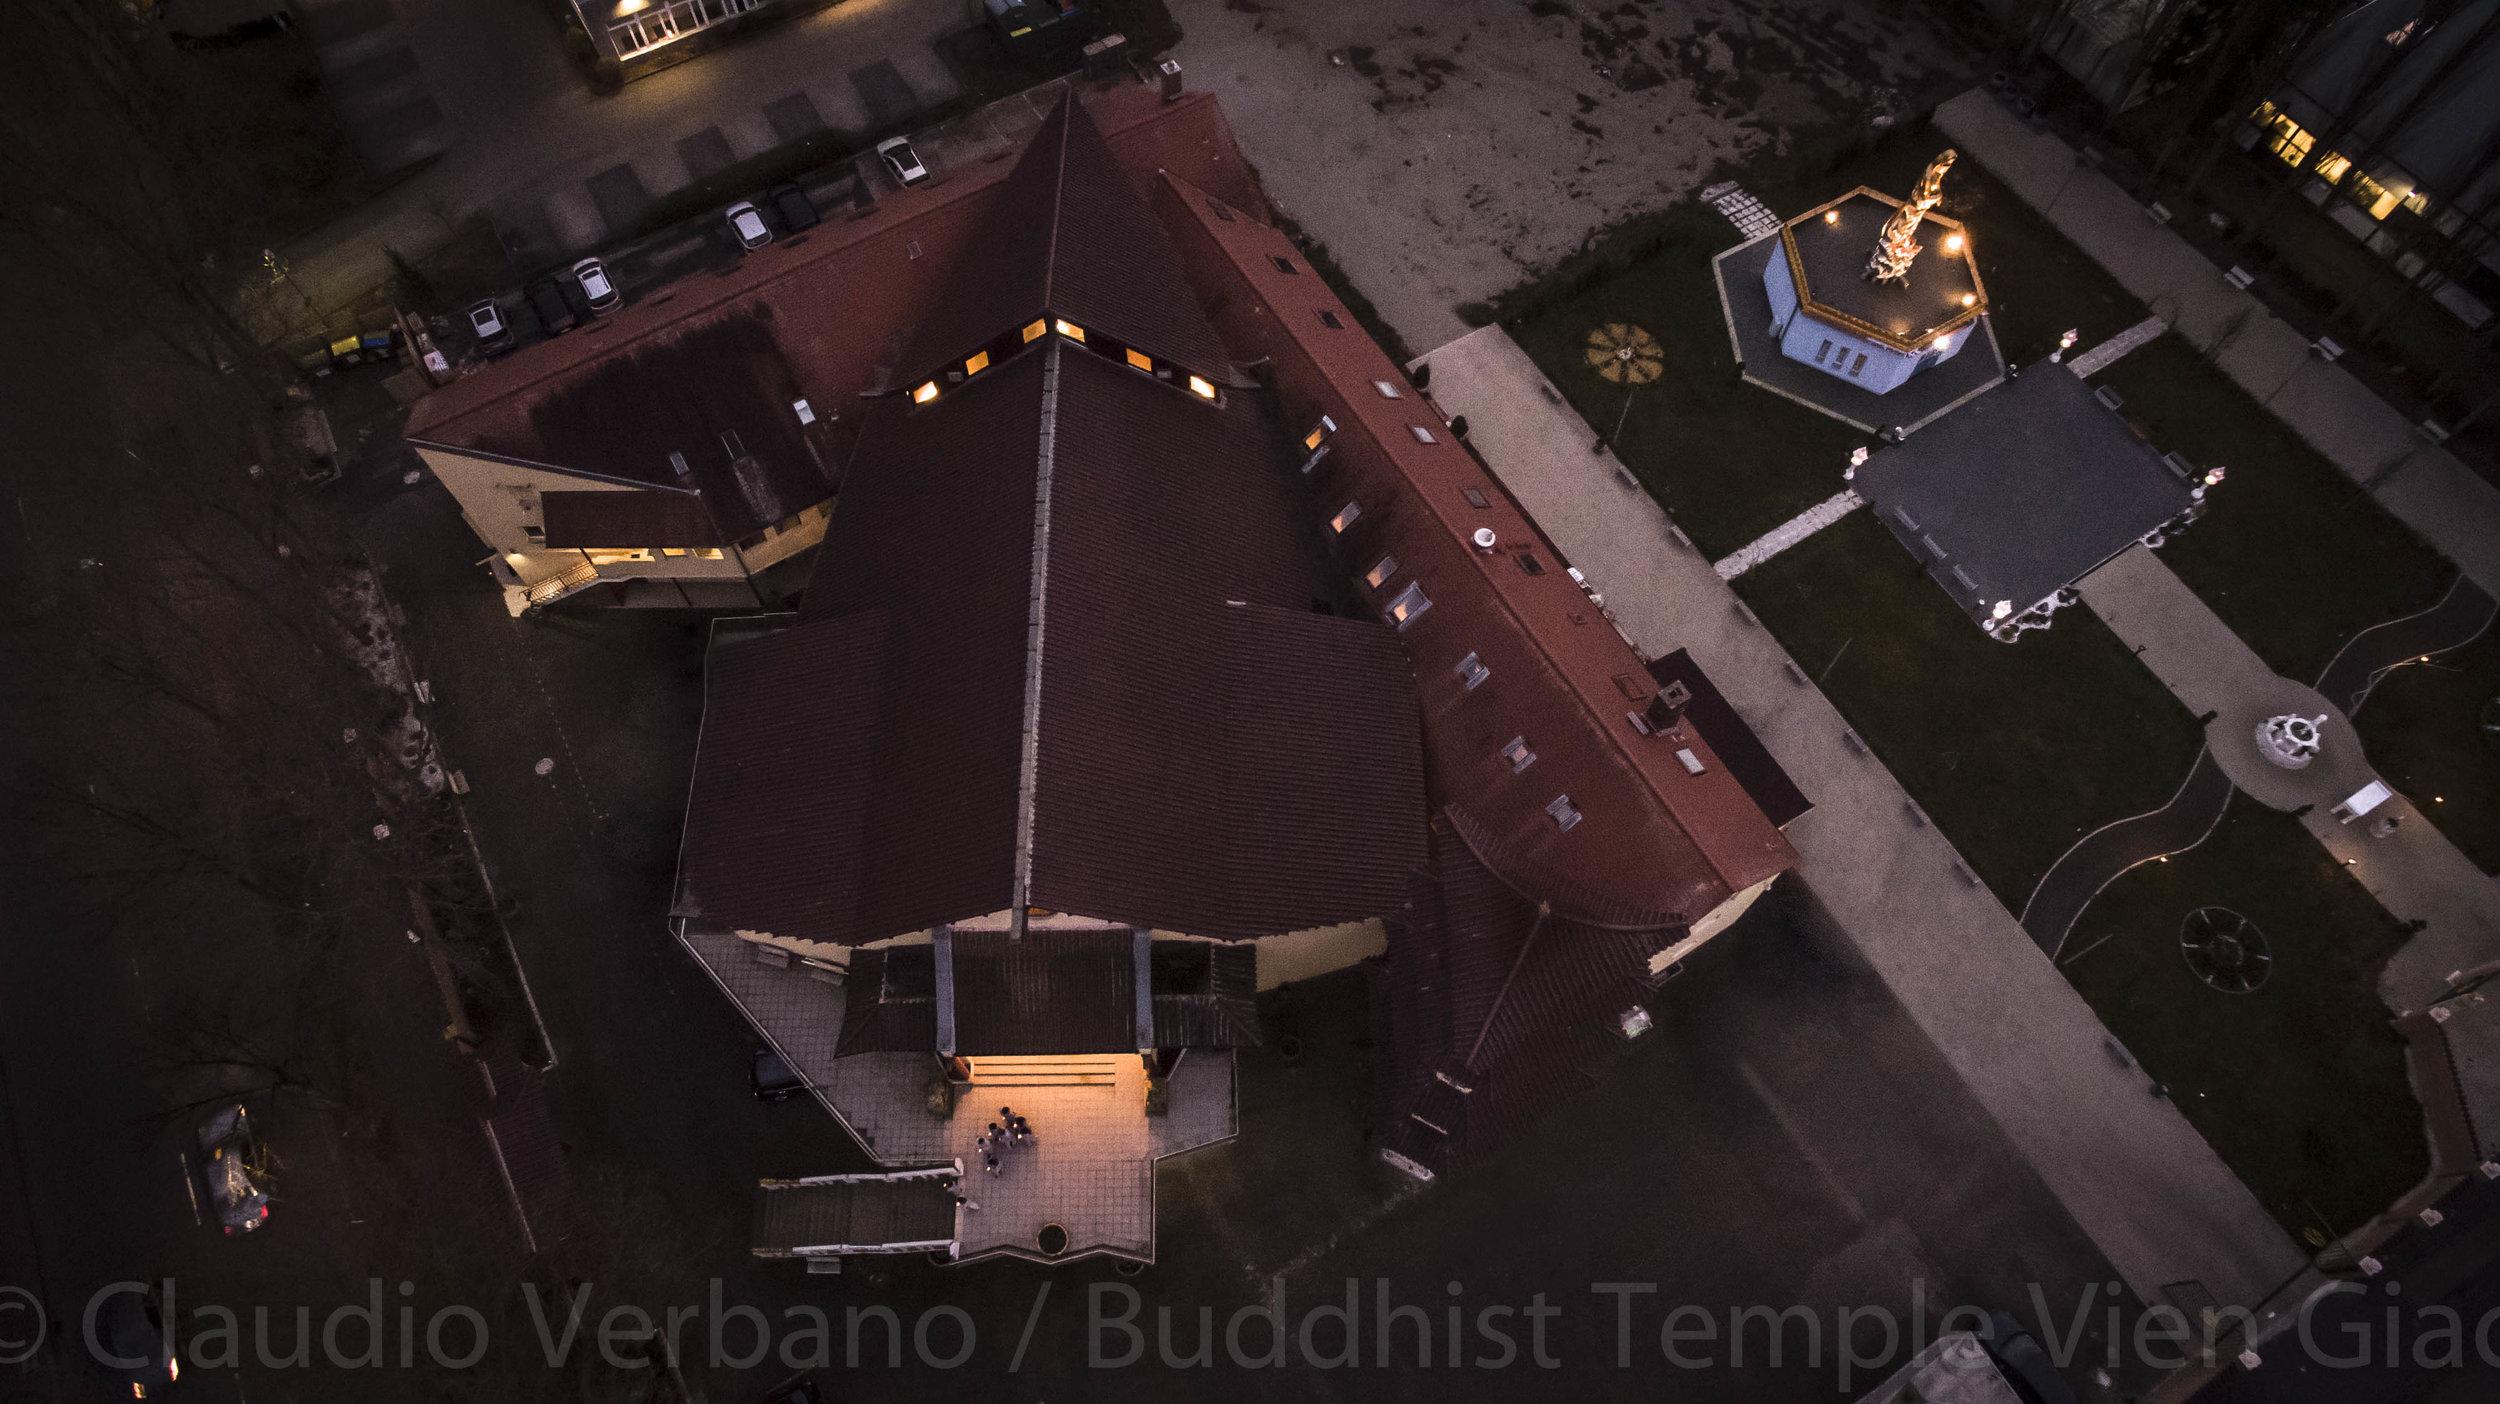 Buddhistischer Tempel Vien Giac Hannover Claudio Verbano_07.jpg